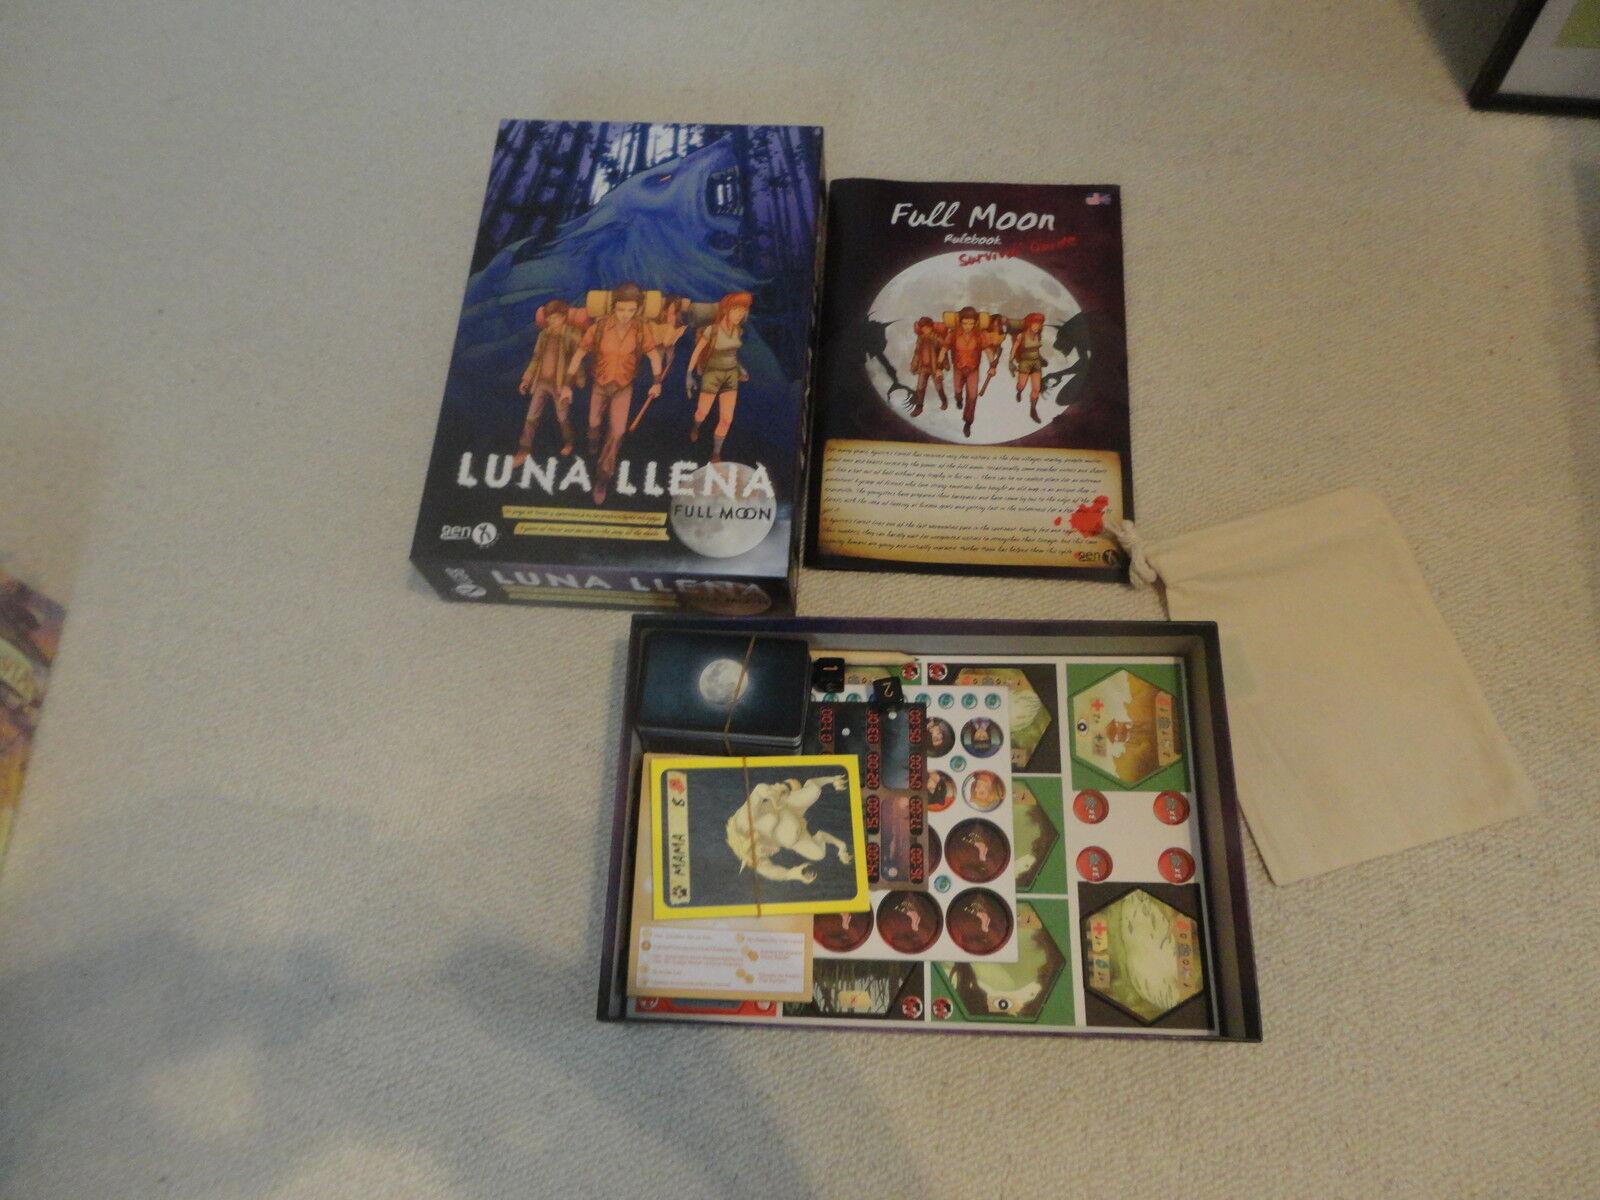 Luna Llena - Full Moon (Gen X Games 2009) Neu  | Stilvoll und lustig